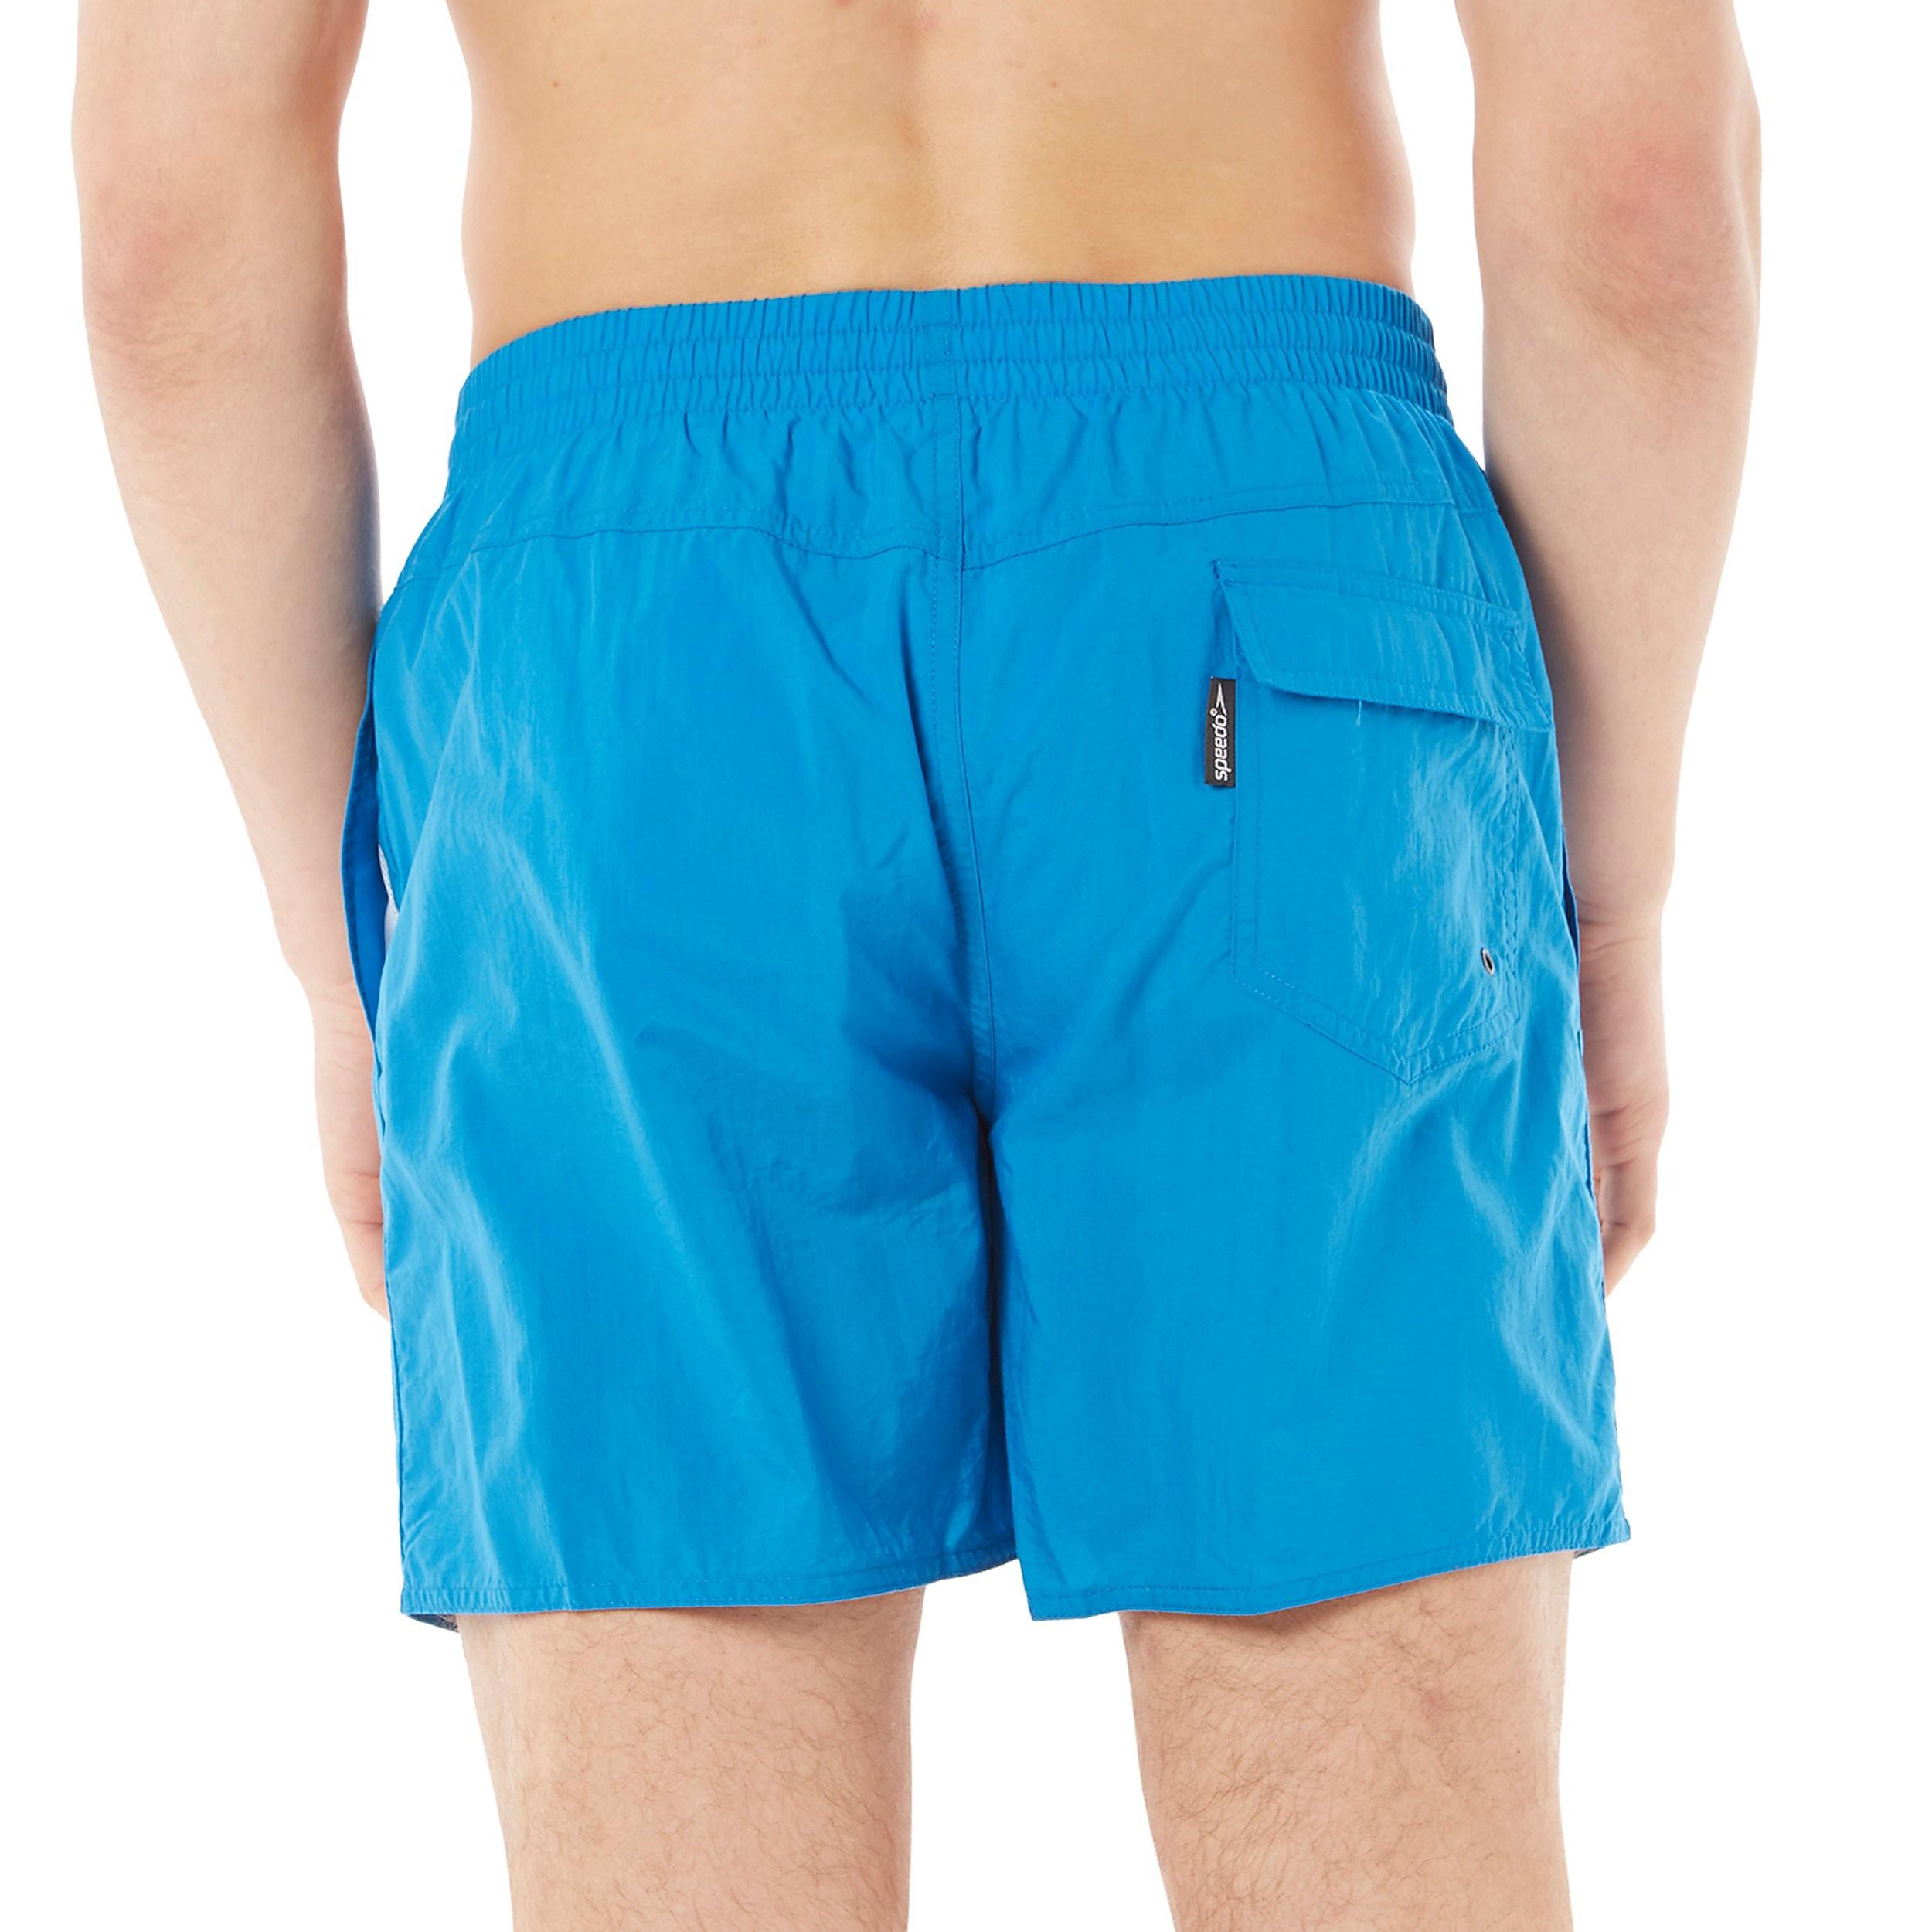 Speedo Solid Leisure Men's Swimshorts